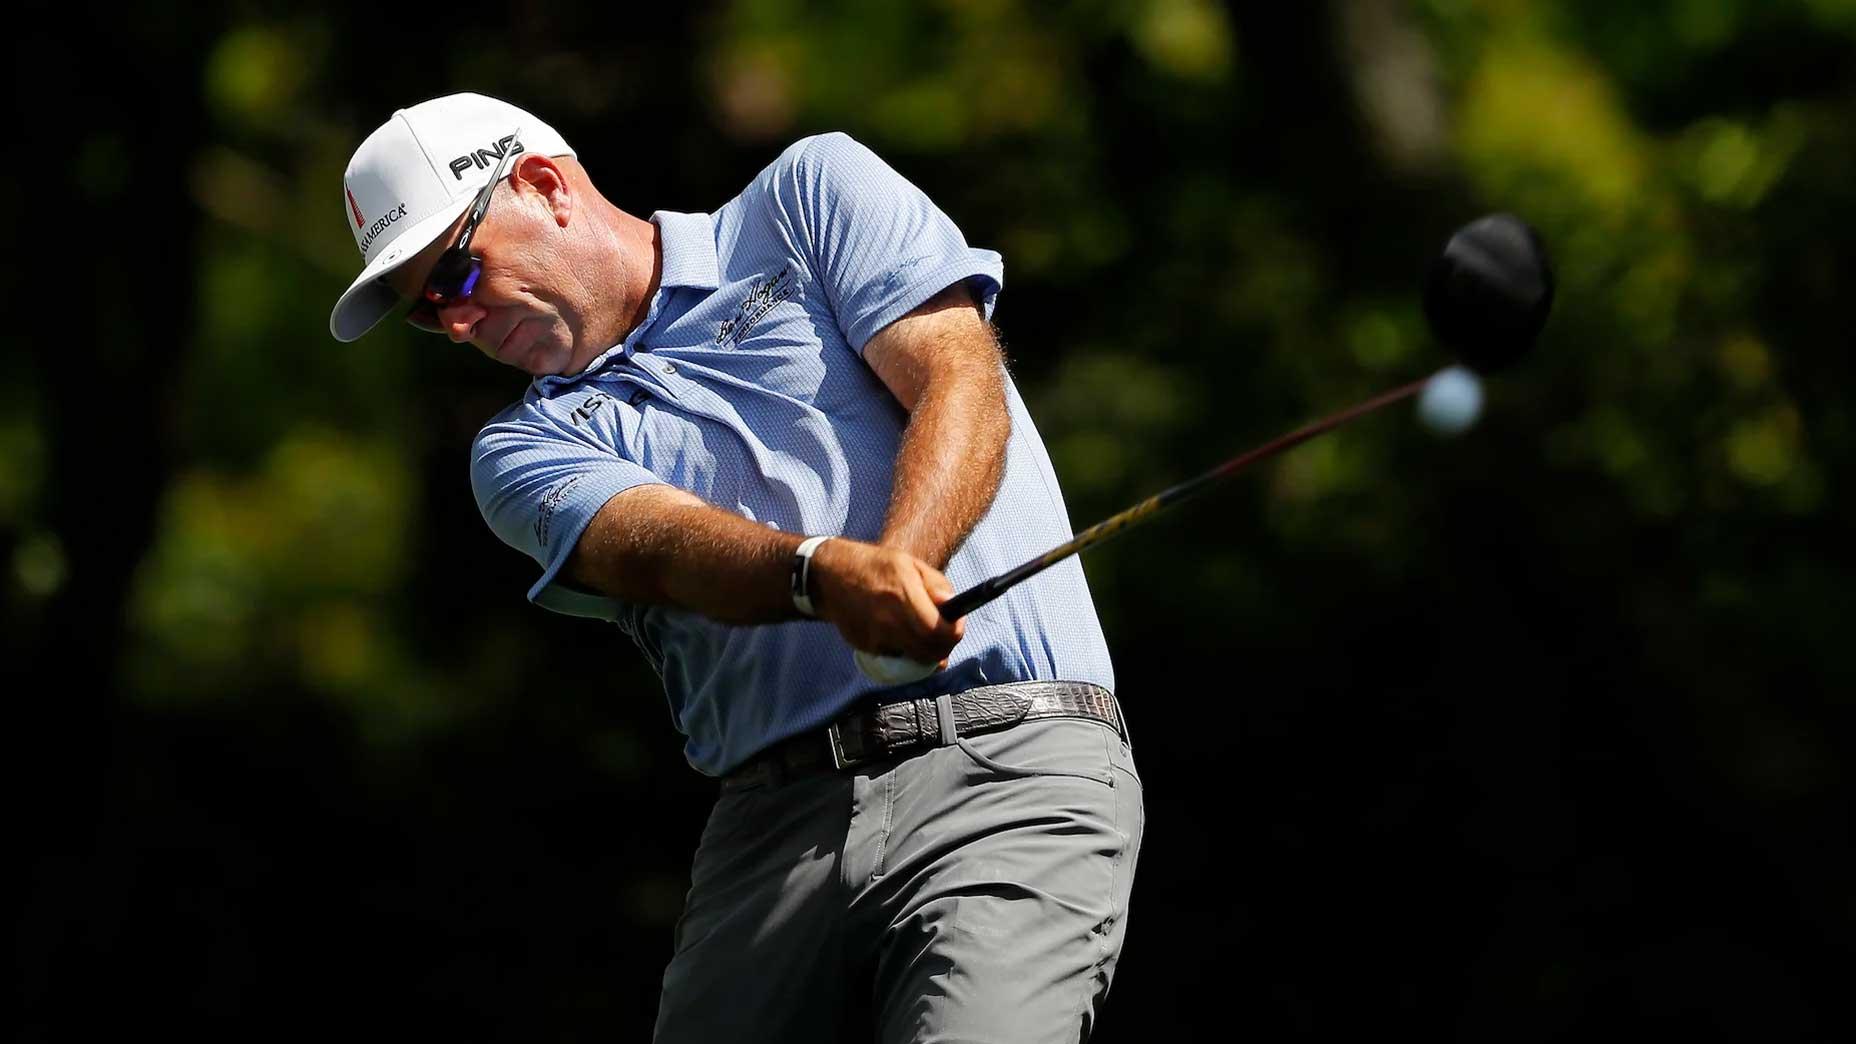 Pro golfer Stewart Cink hits drive